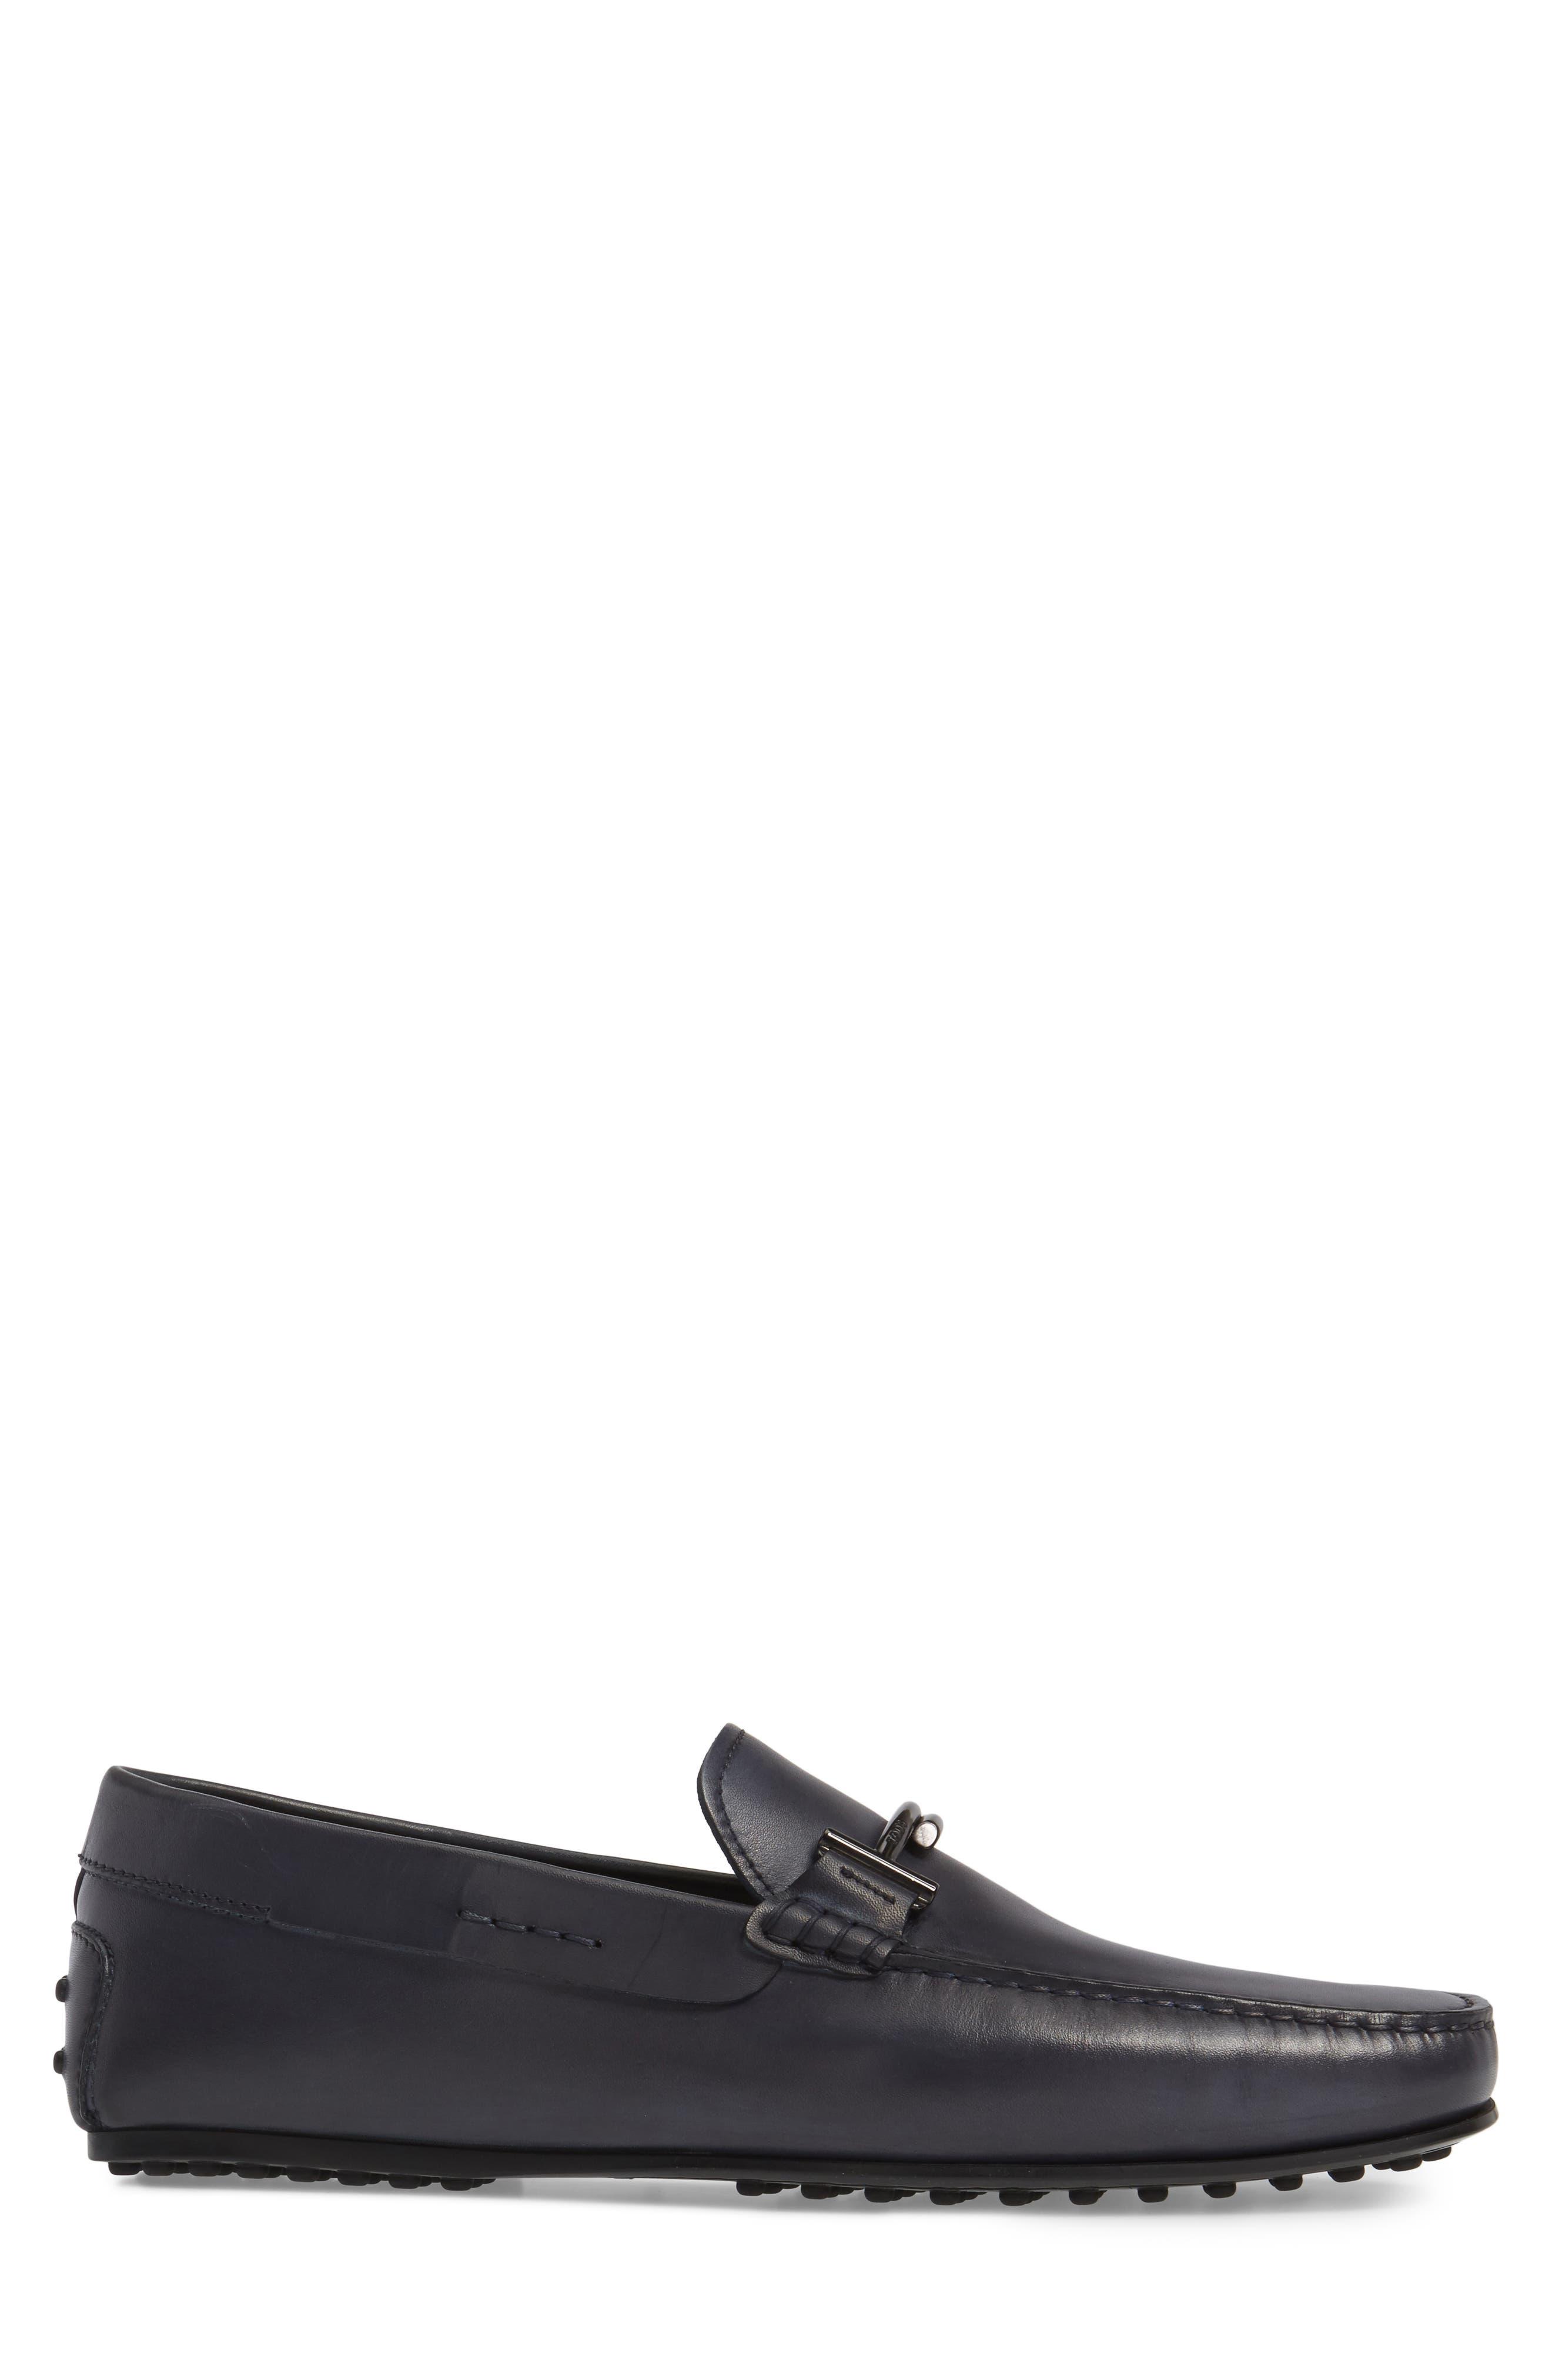 Gommini Driving Shoe,                             Alternate thumbnail 3, color,                             Dark Grey Leather